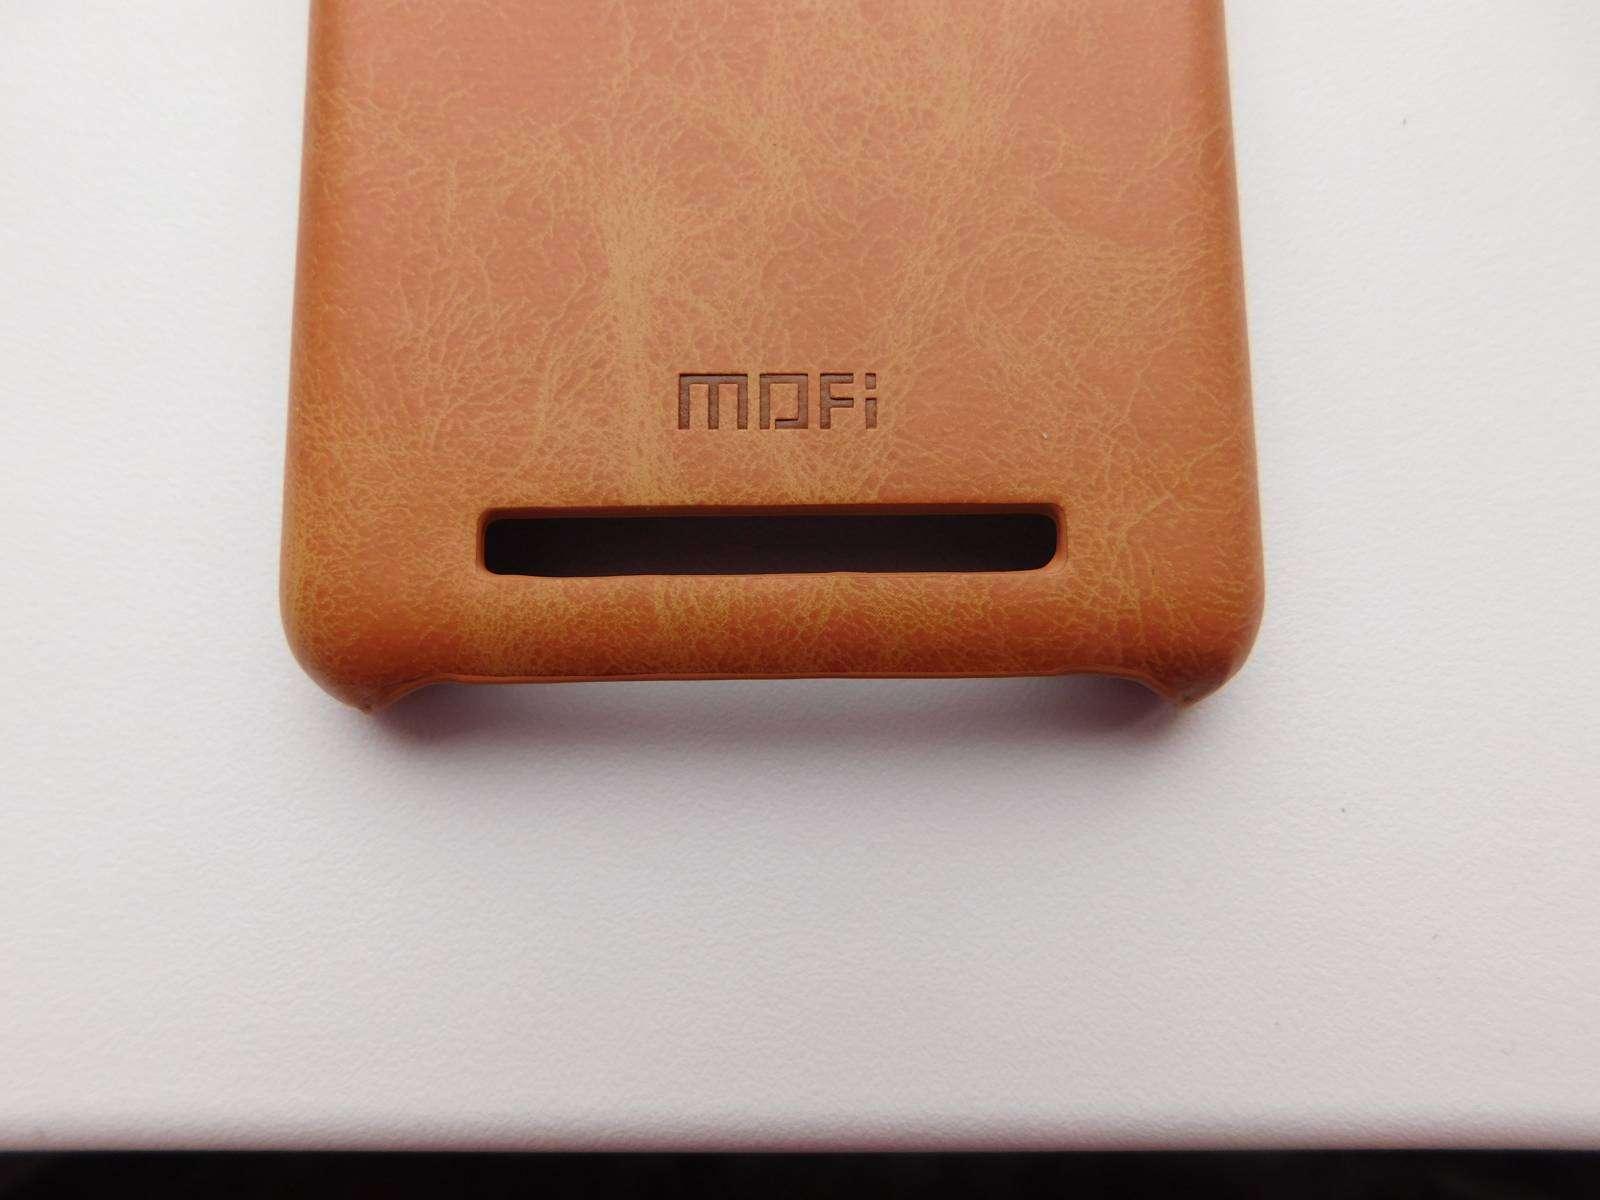 Banggood: Бампер MOFi для Xiaomi Redmi 3S и Pro